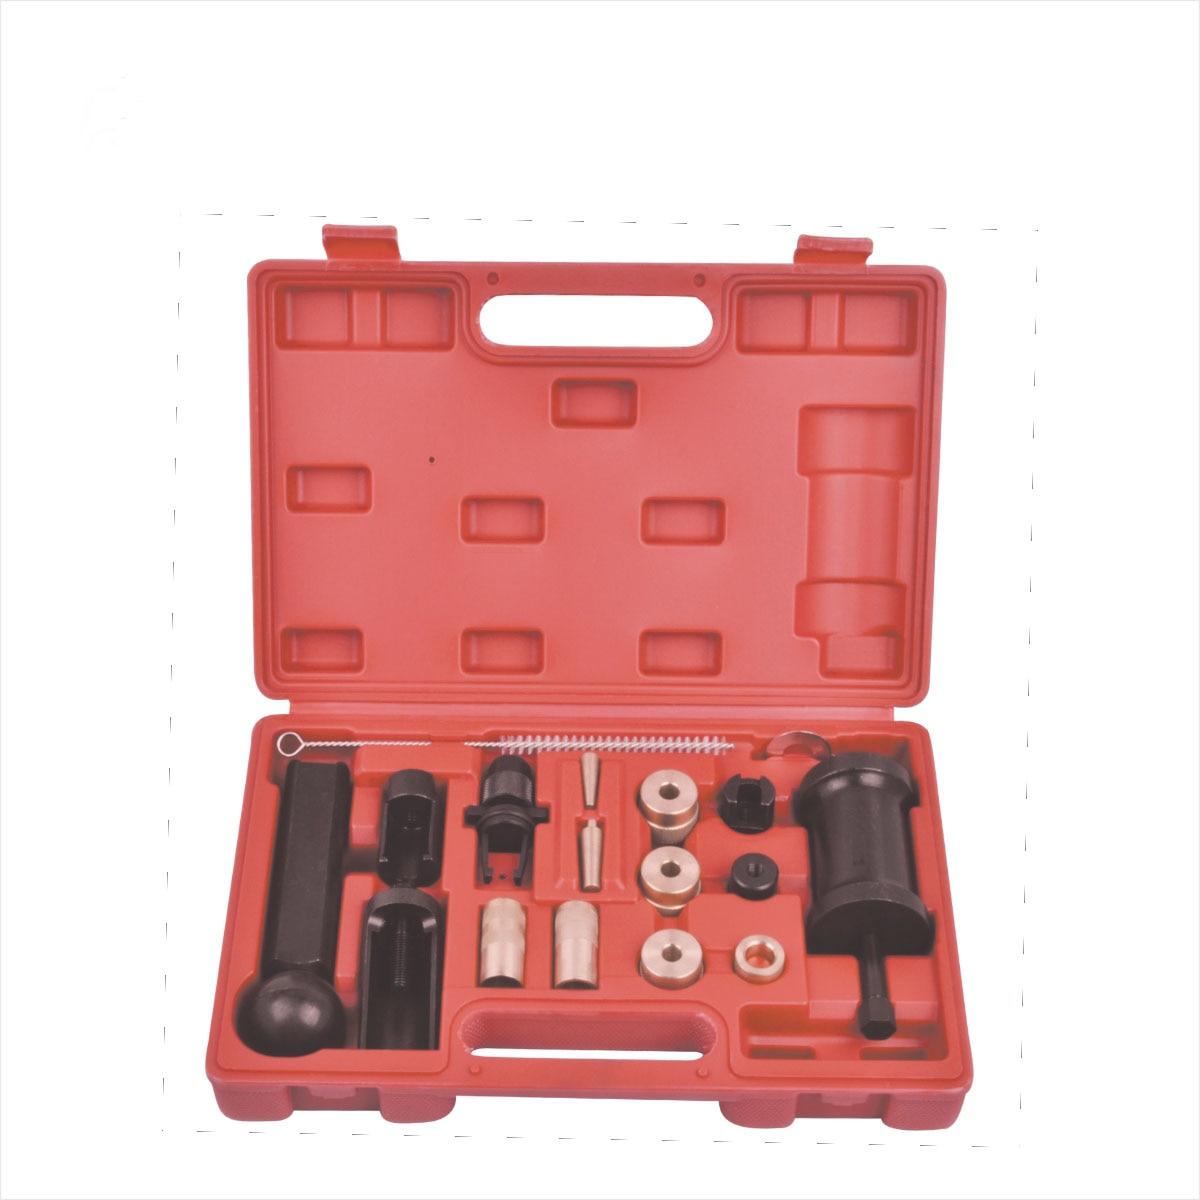 18PC Injector Puller Removal Installer Tools Set For VAG Audi VW FSI Petrol